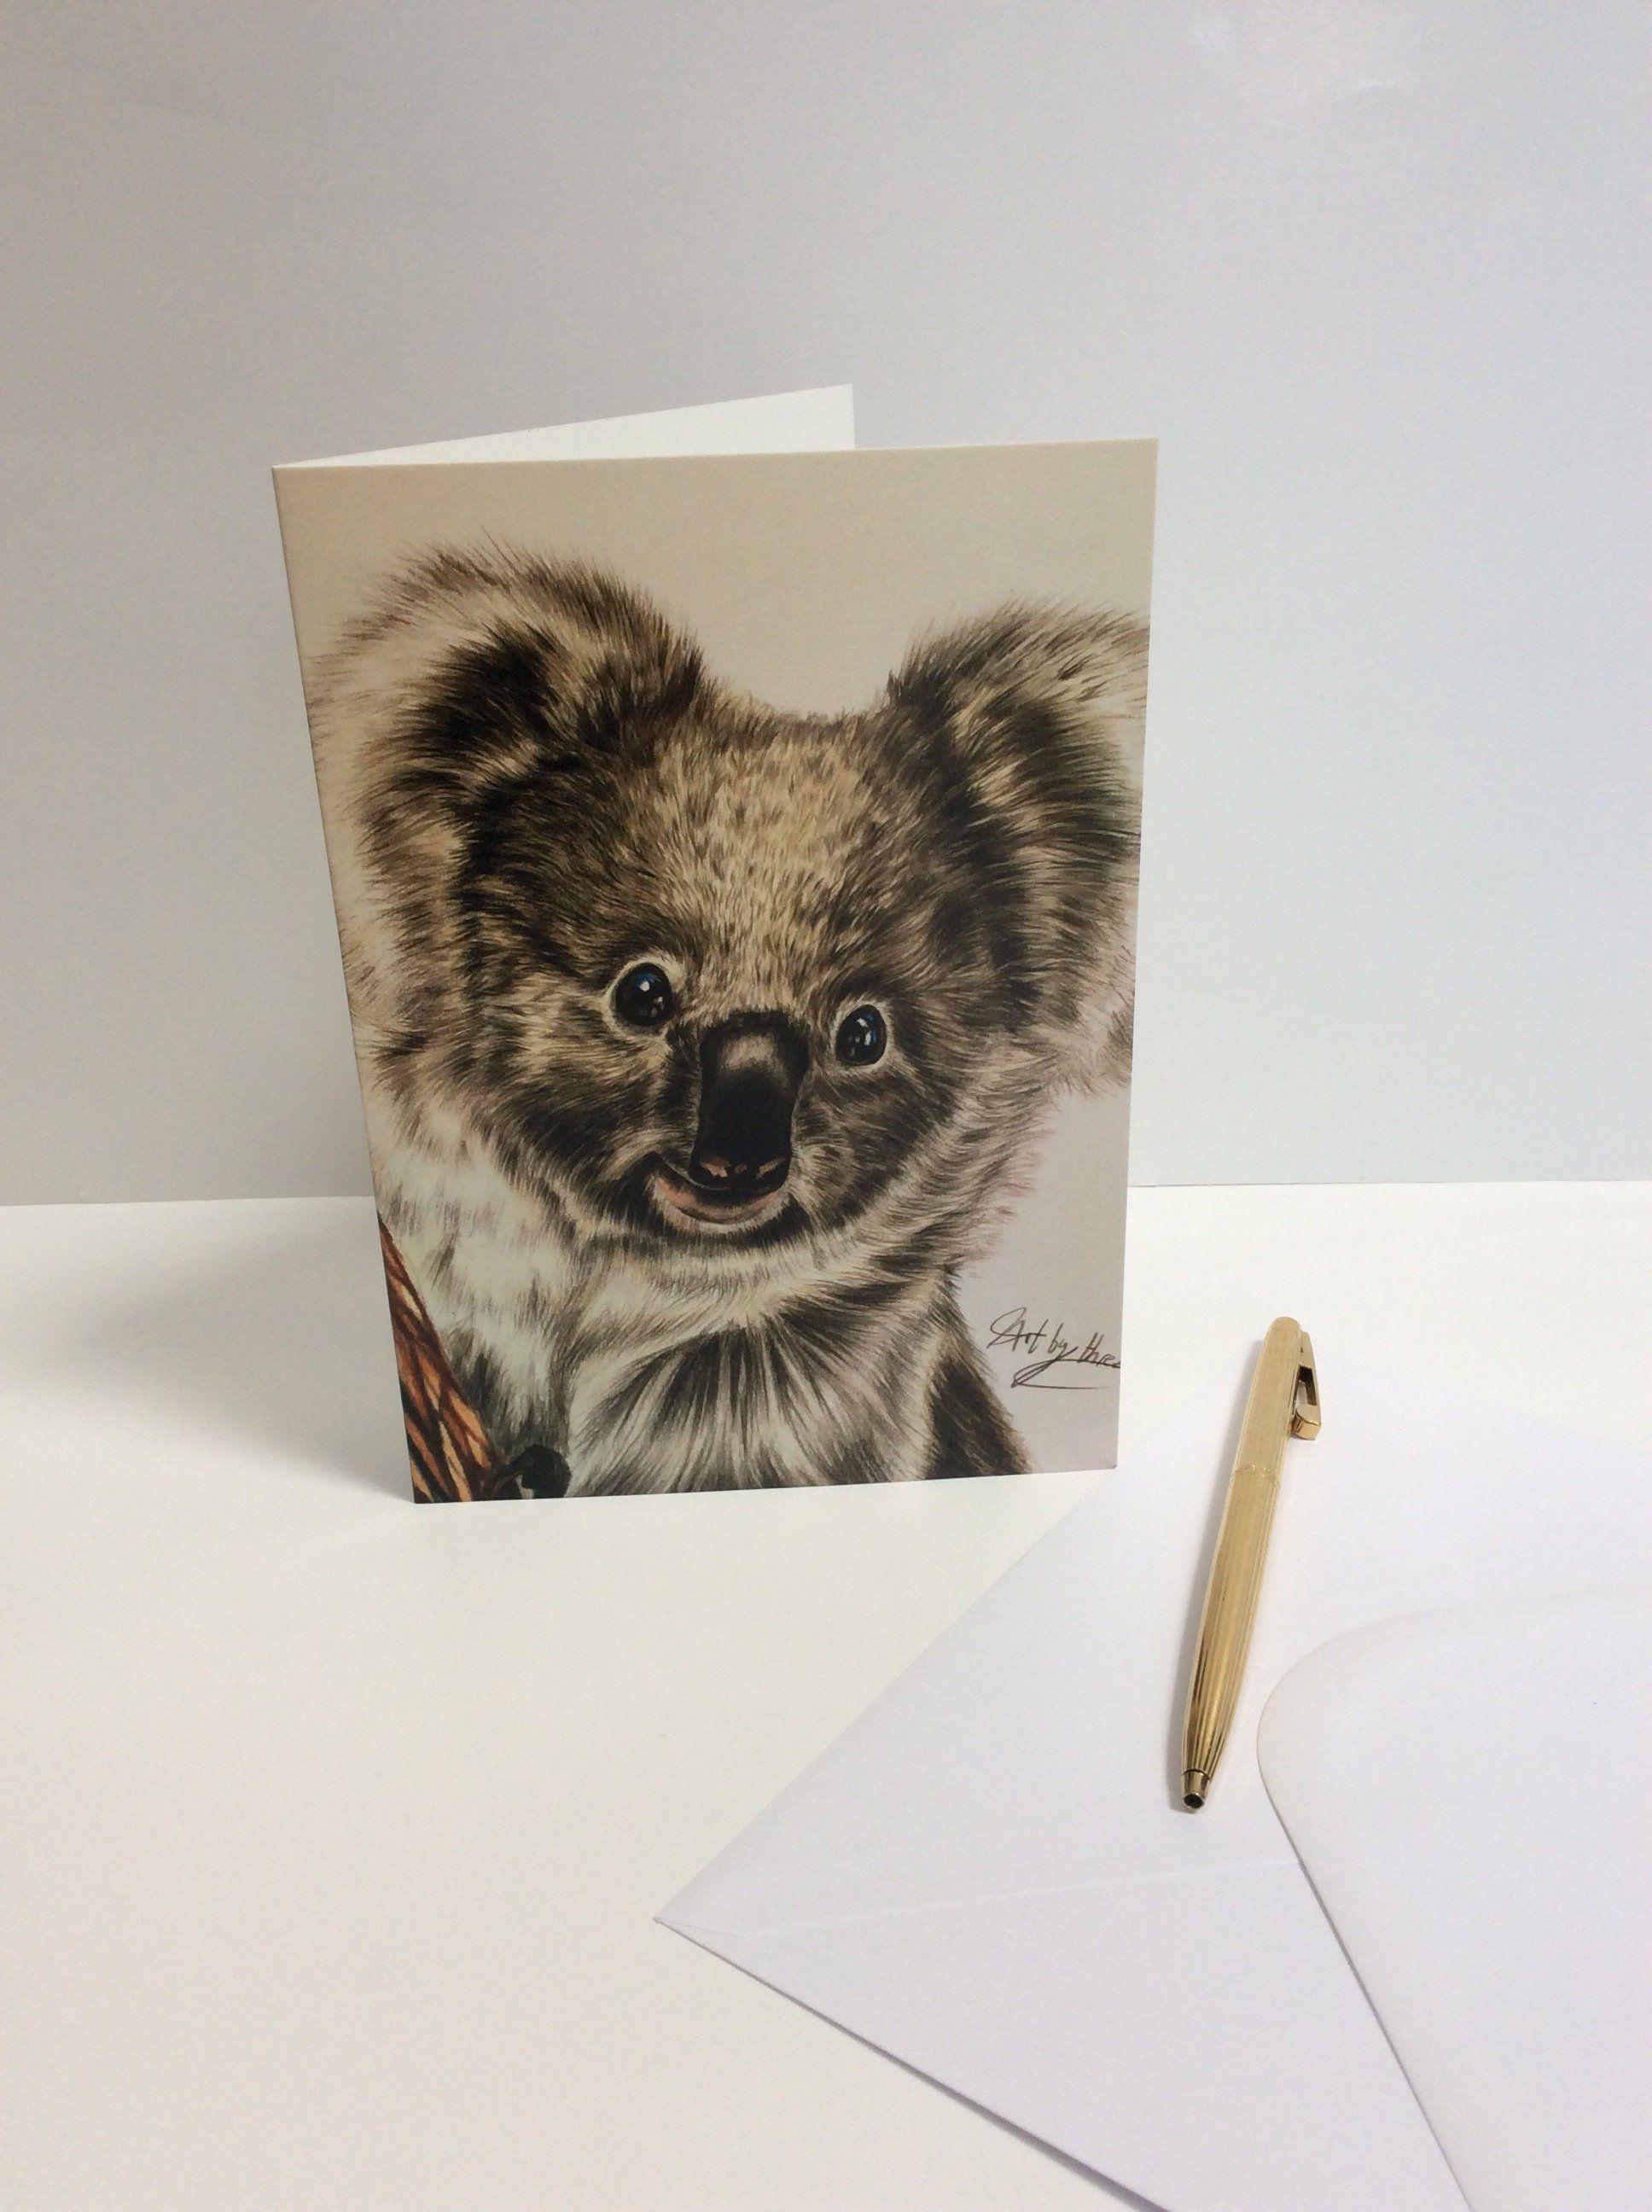 Koala Bear Card Koala Greeting Card Cute Animal Blank Wildlife